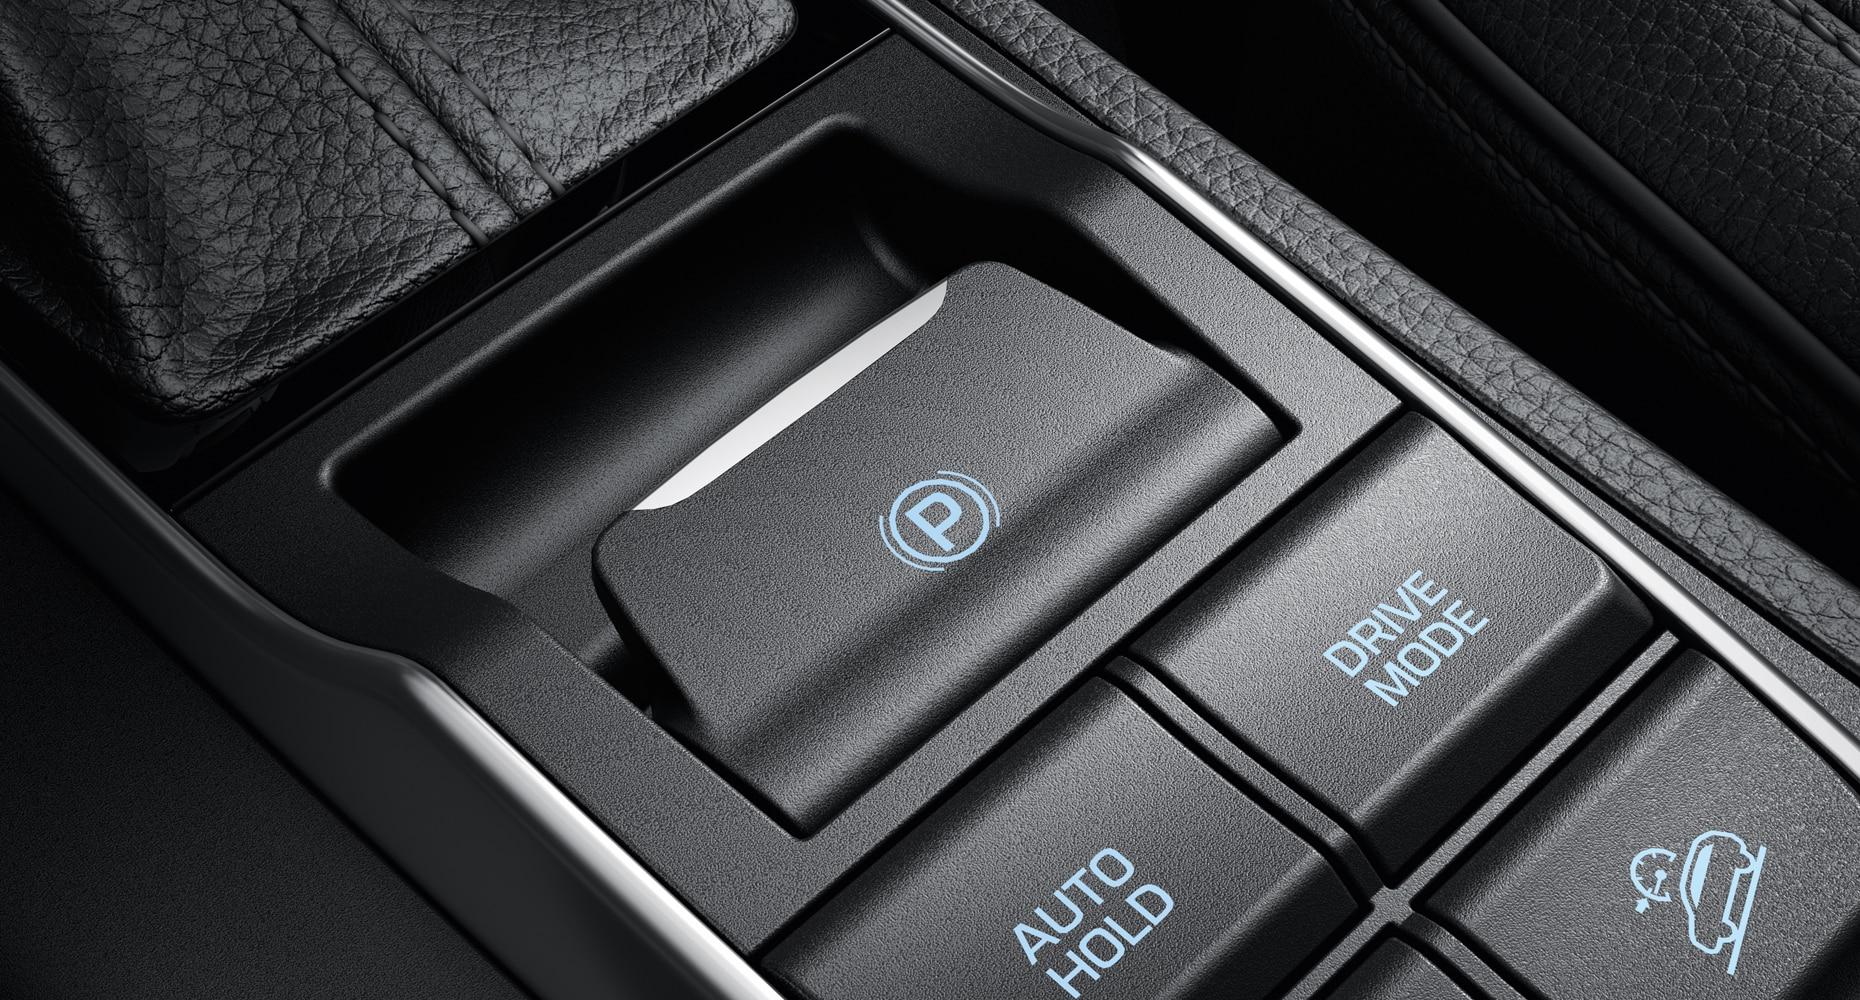 Drive Mode Select